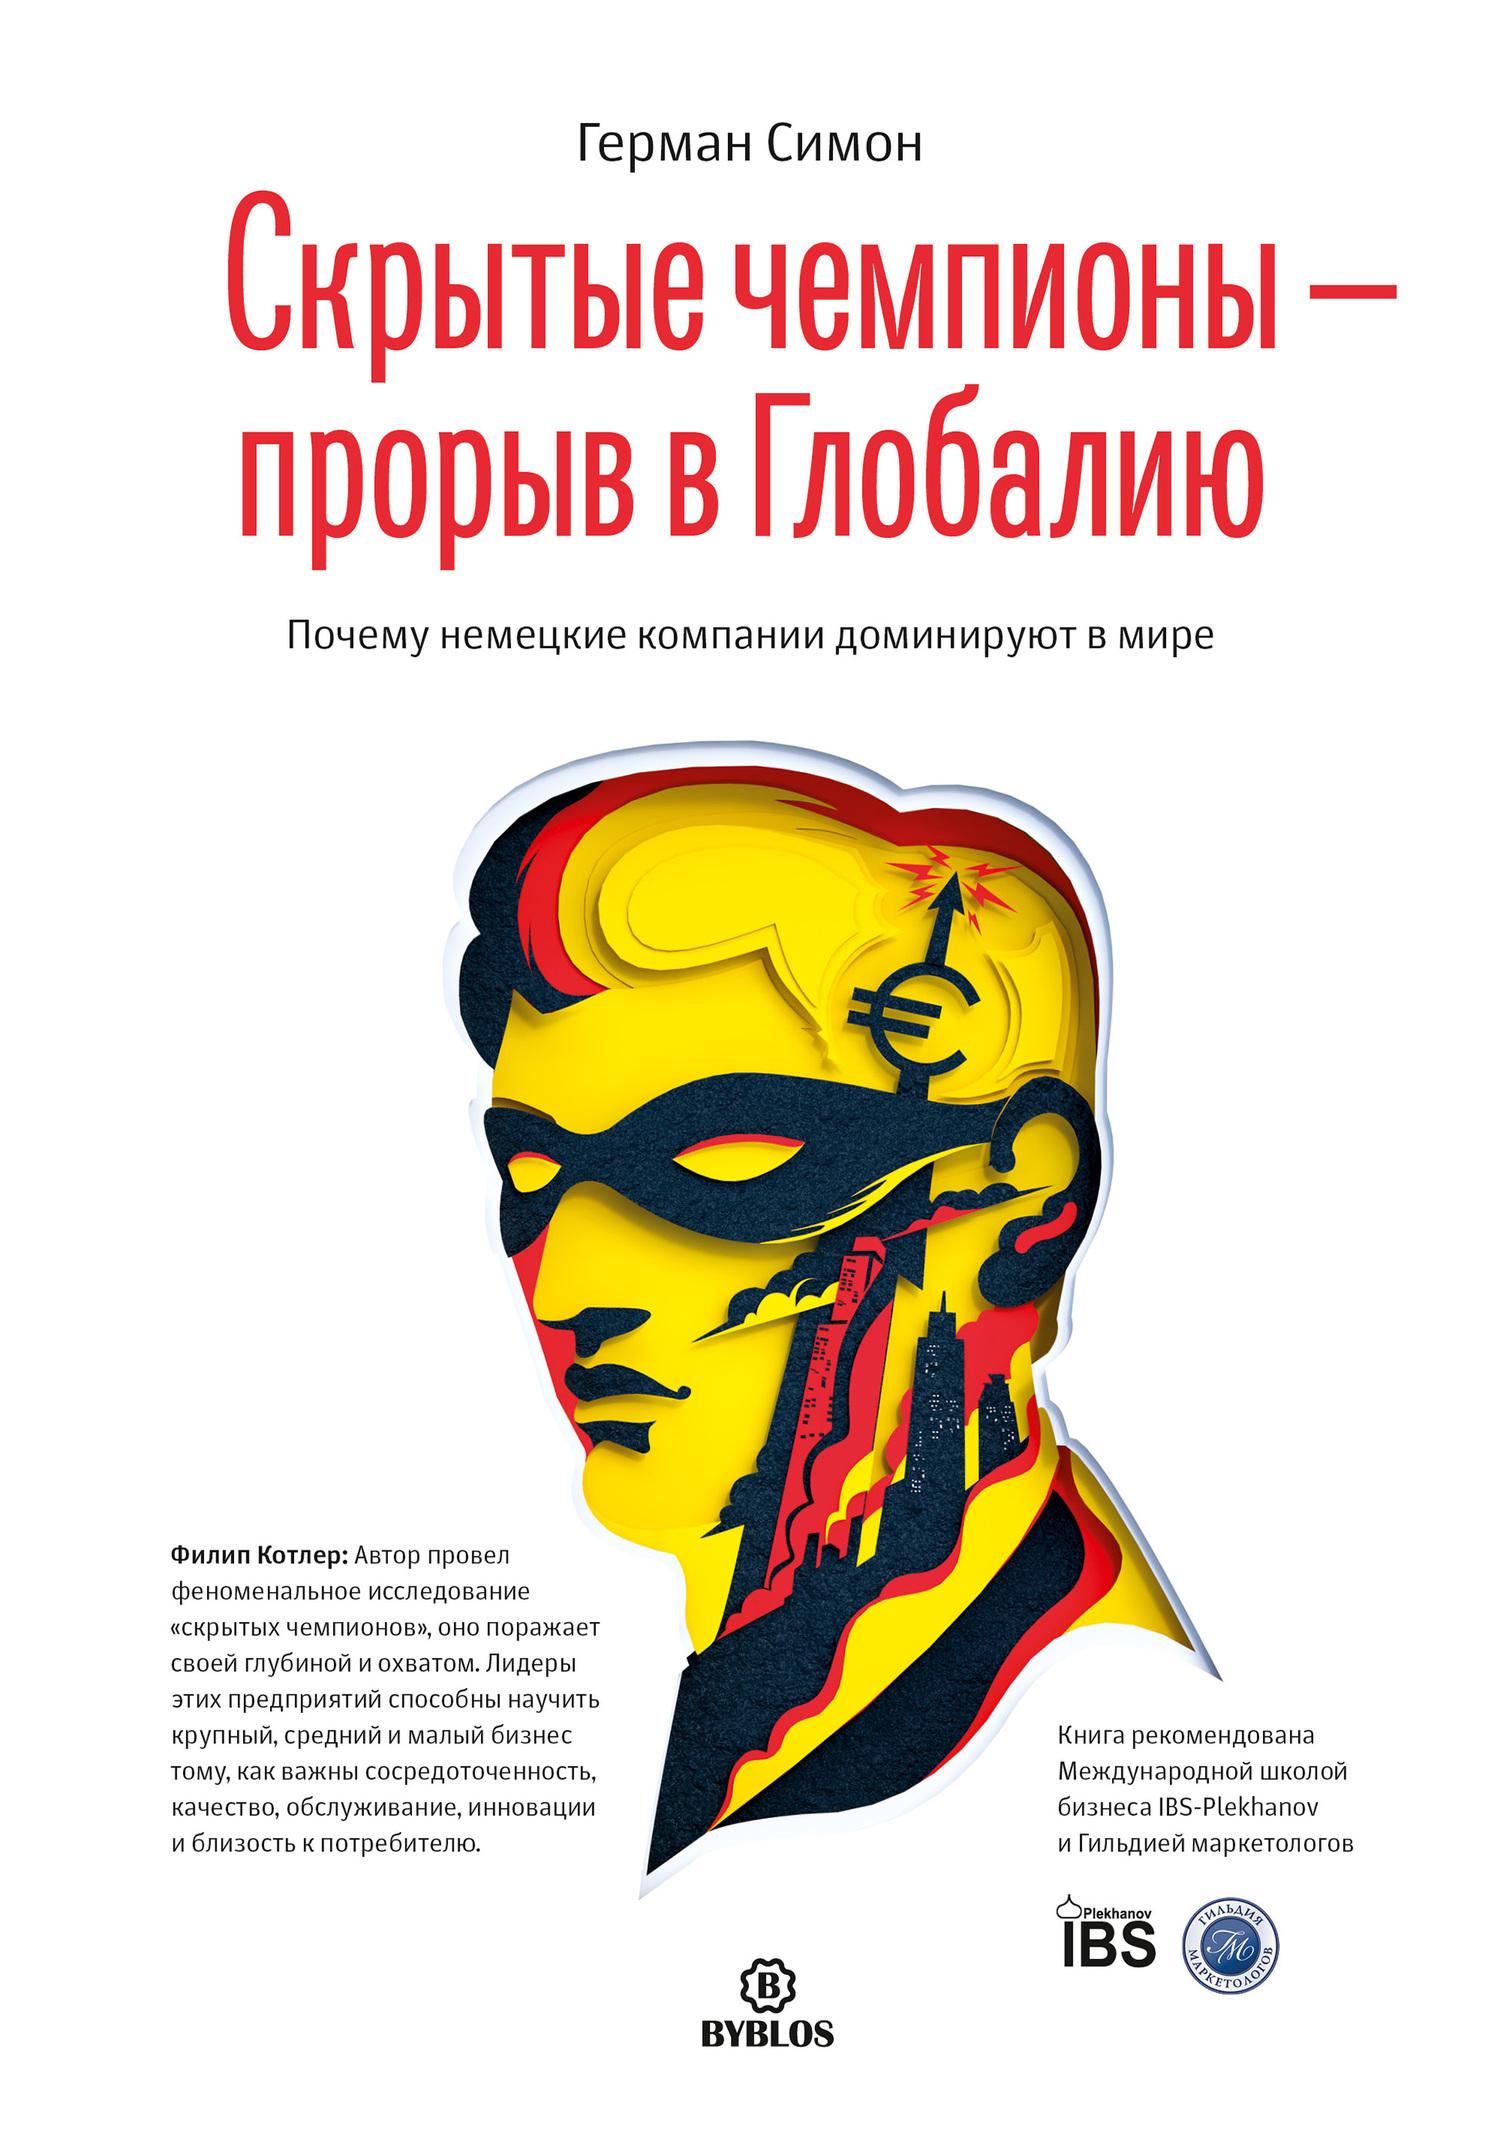 Обложка книги. Автор - Герман Симон